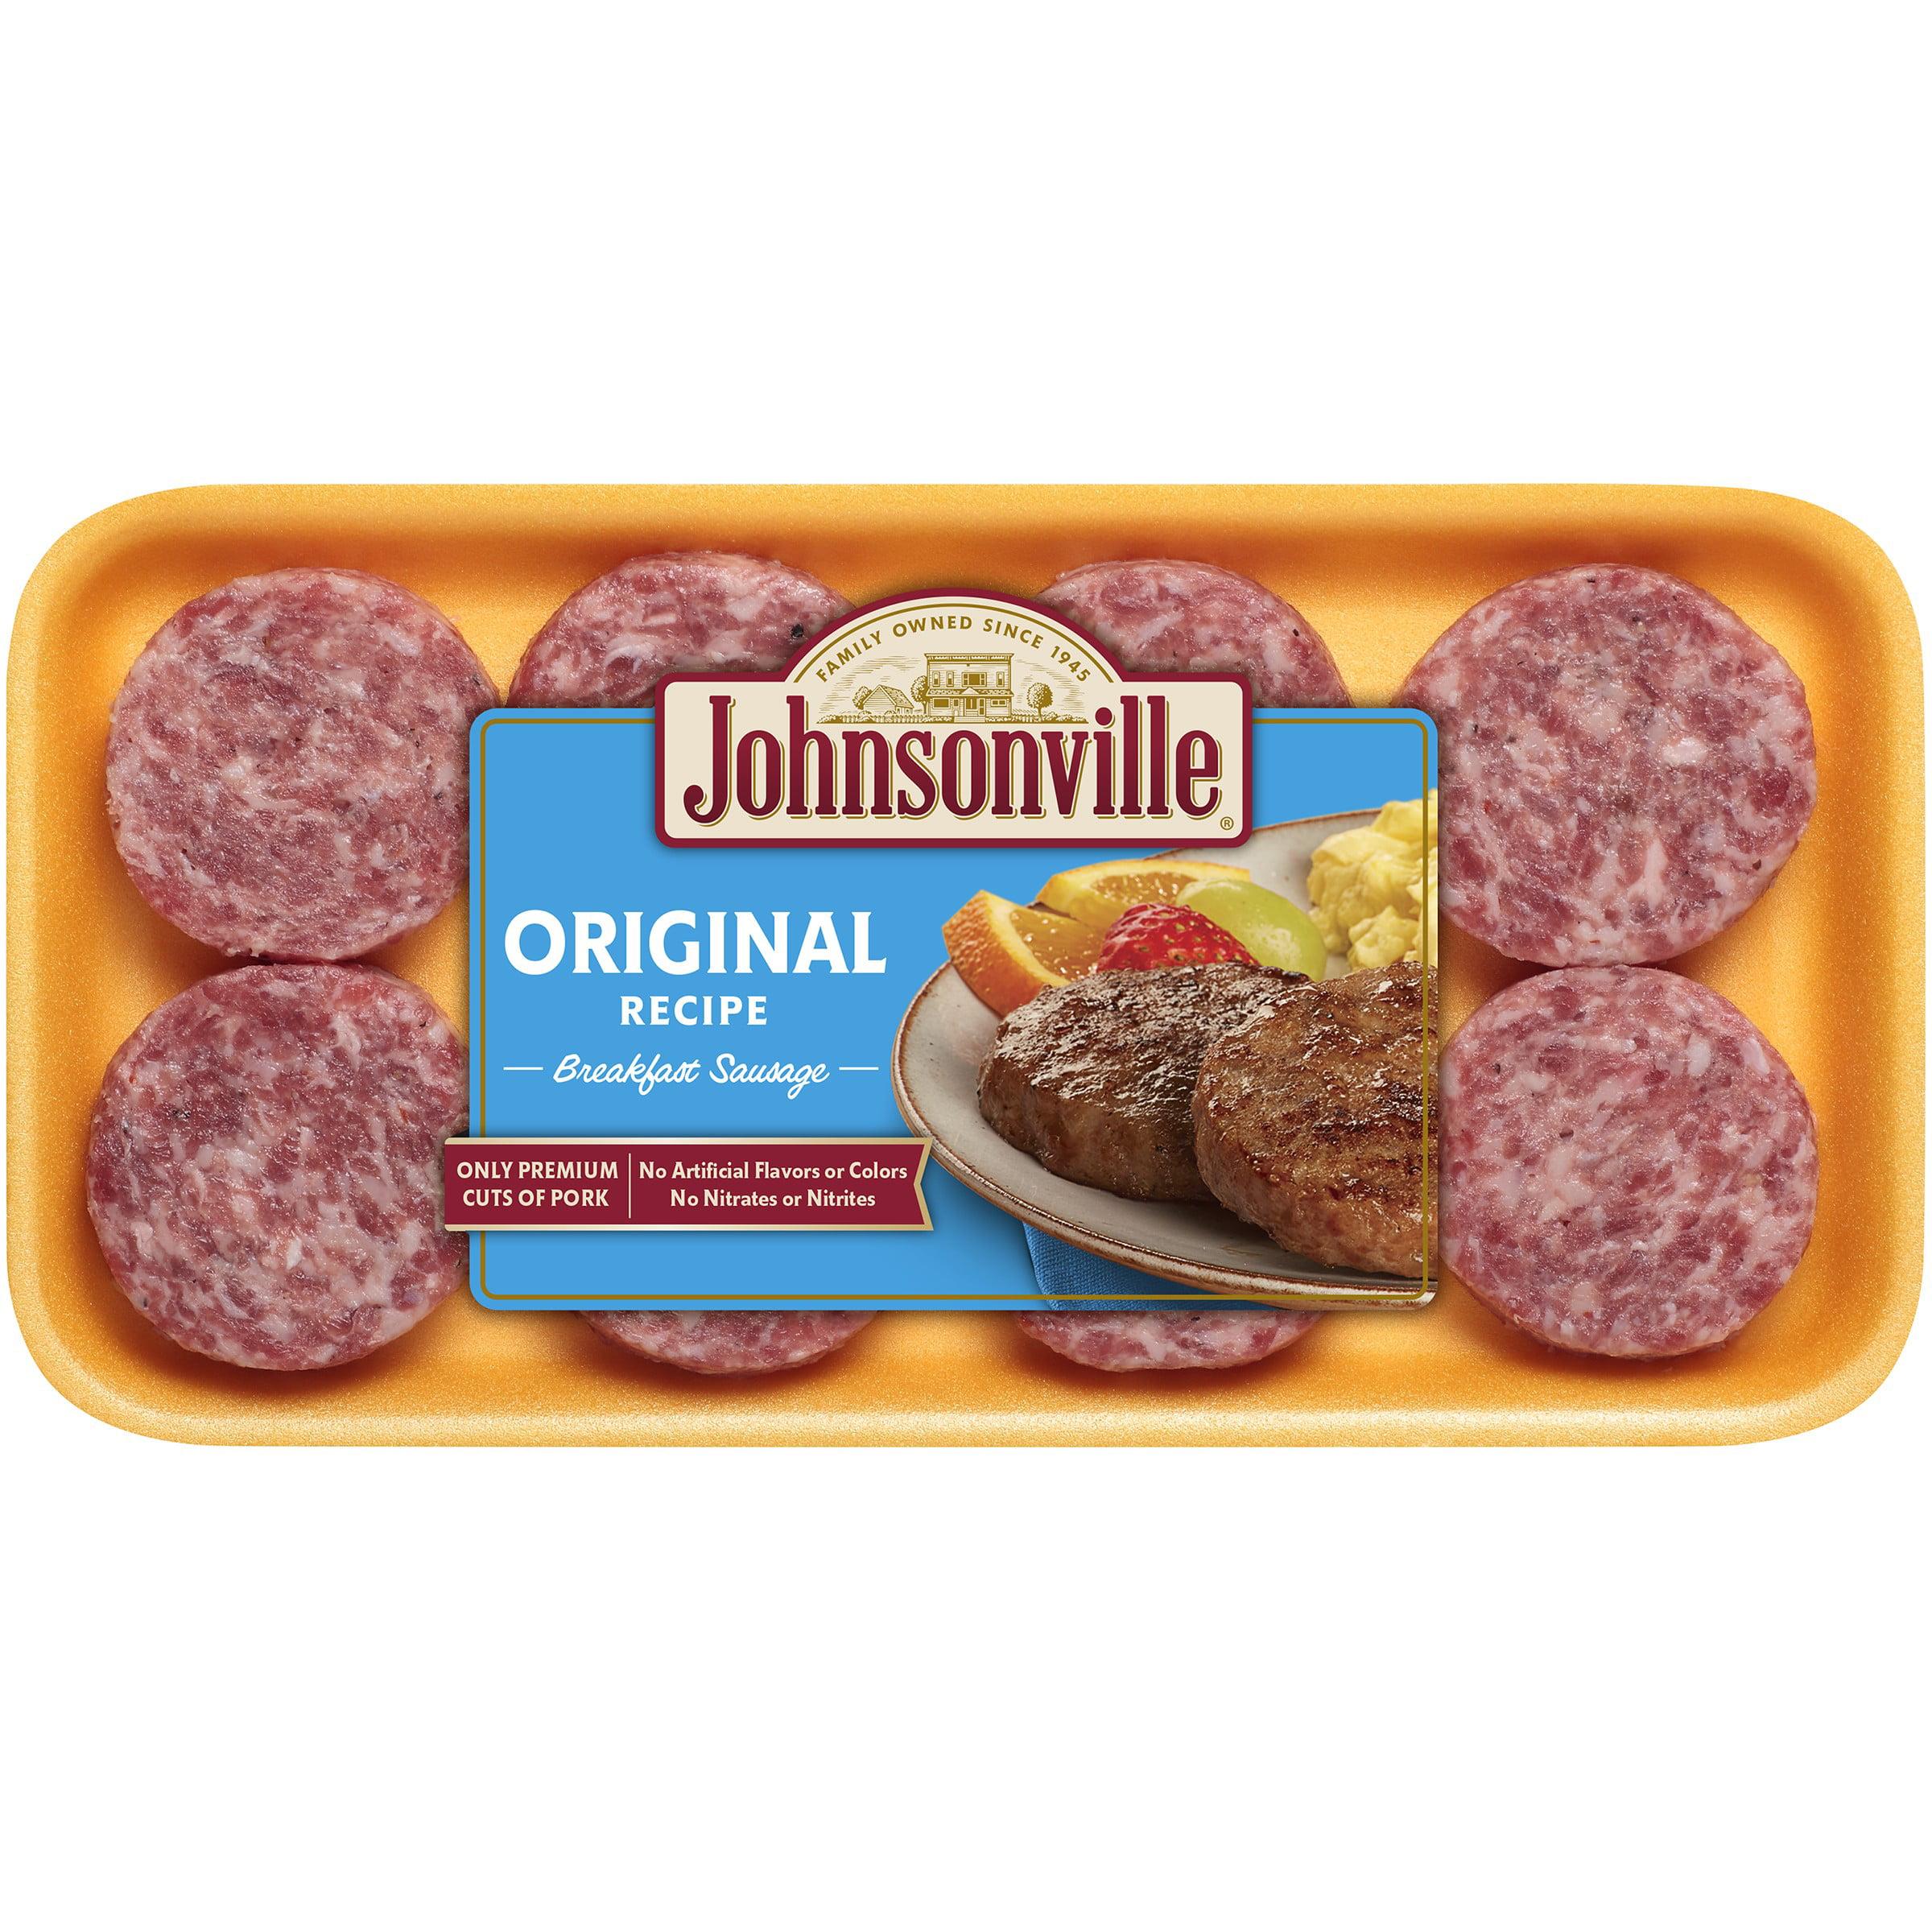 Great Johnsonville Original Breakfast Patties 8ct 12oz Tray (100965)   Walmart.com